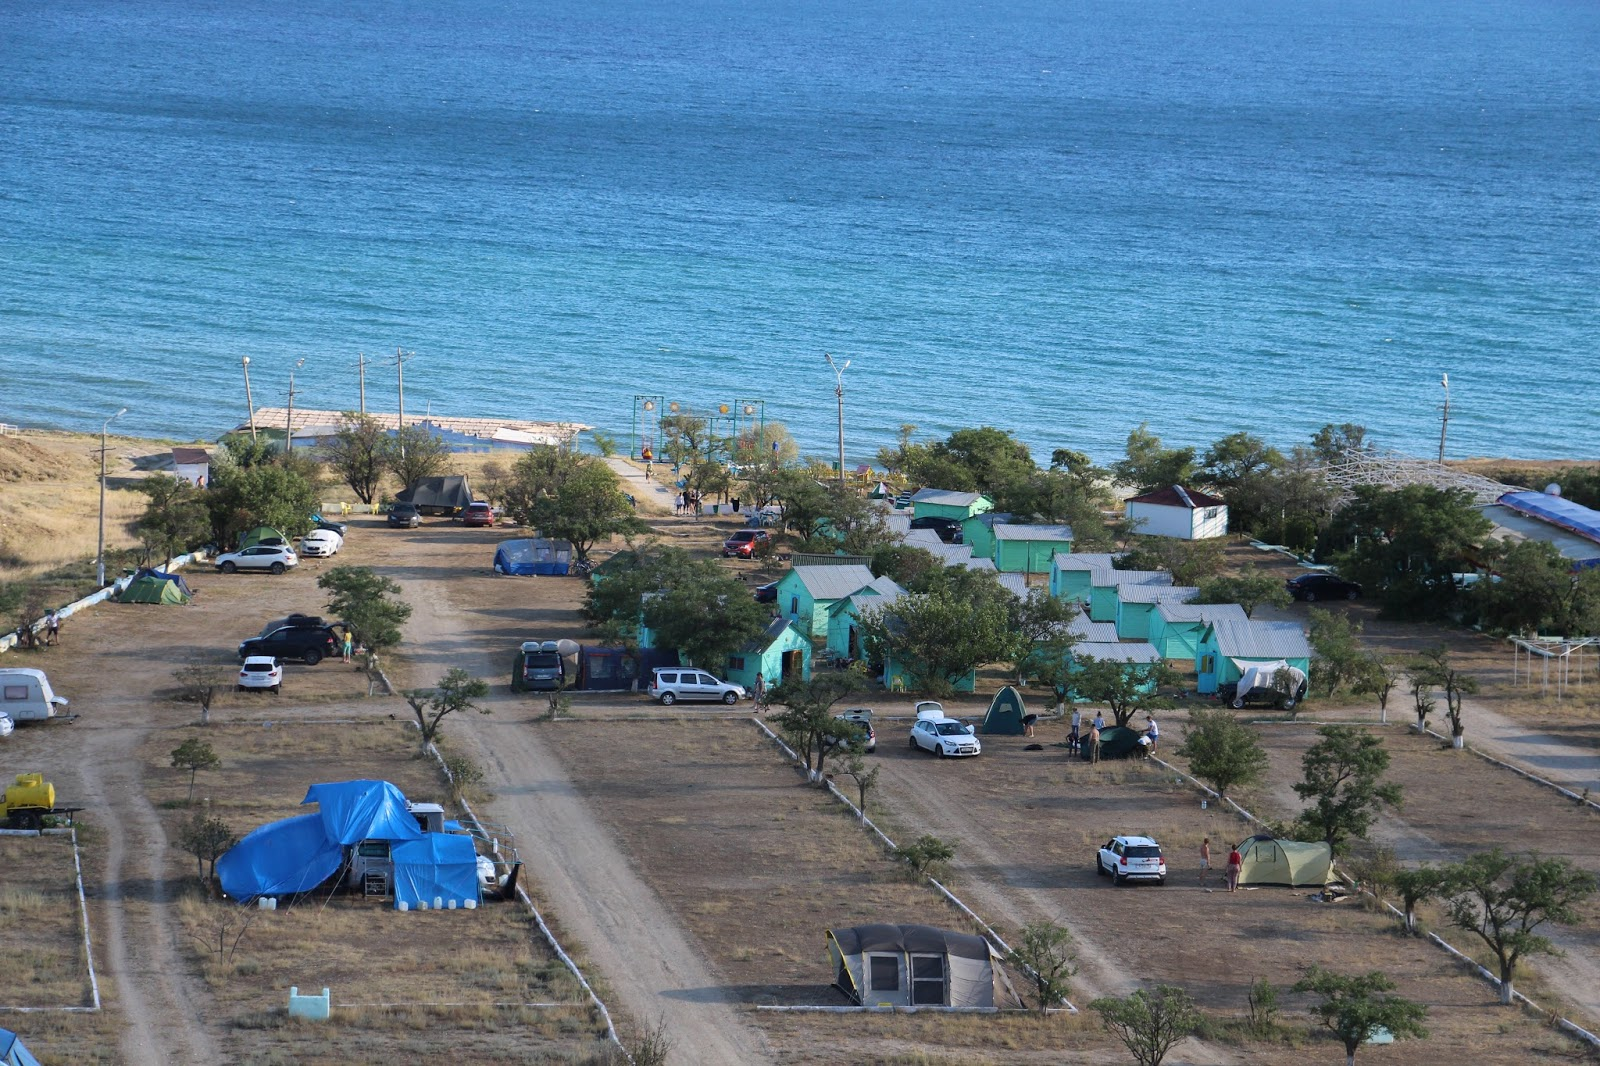 крым кемпинги на берегу моря отдых